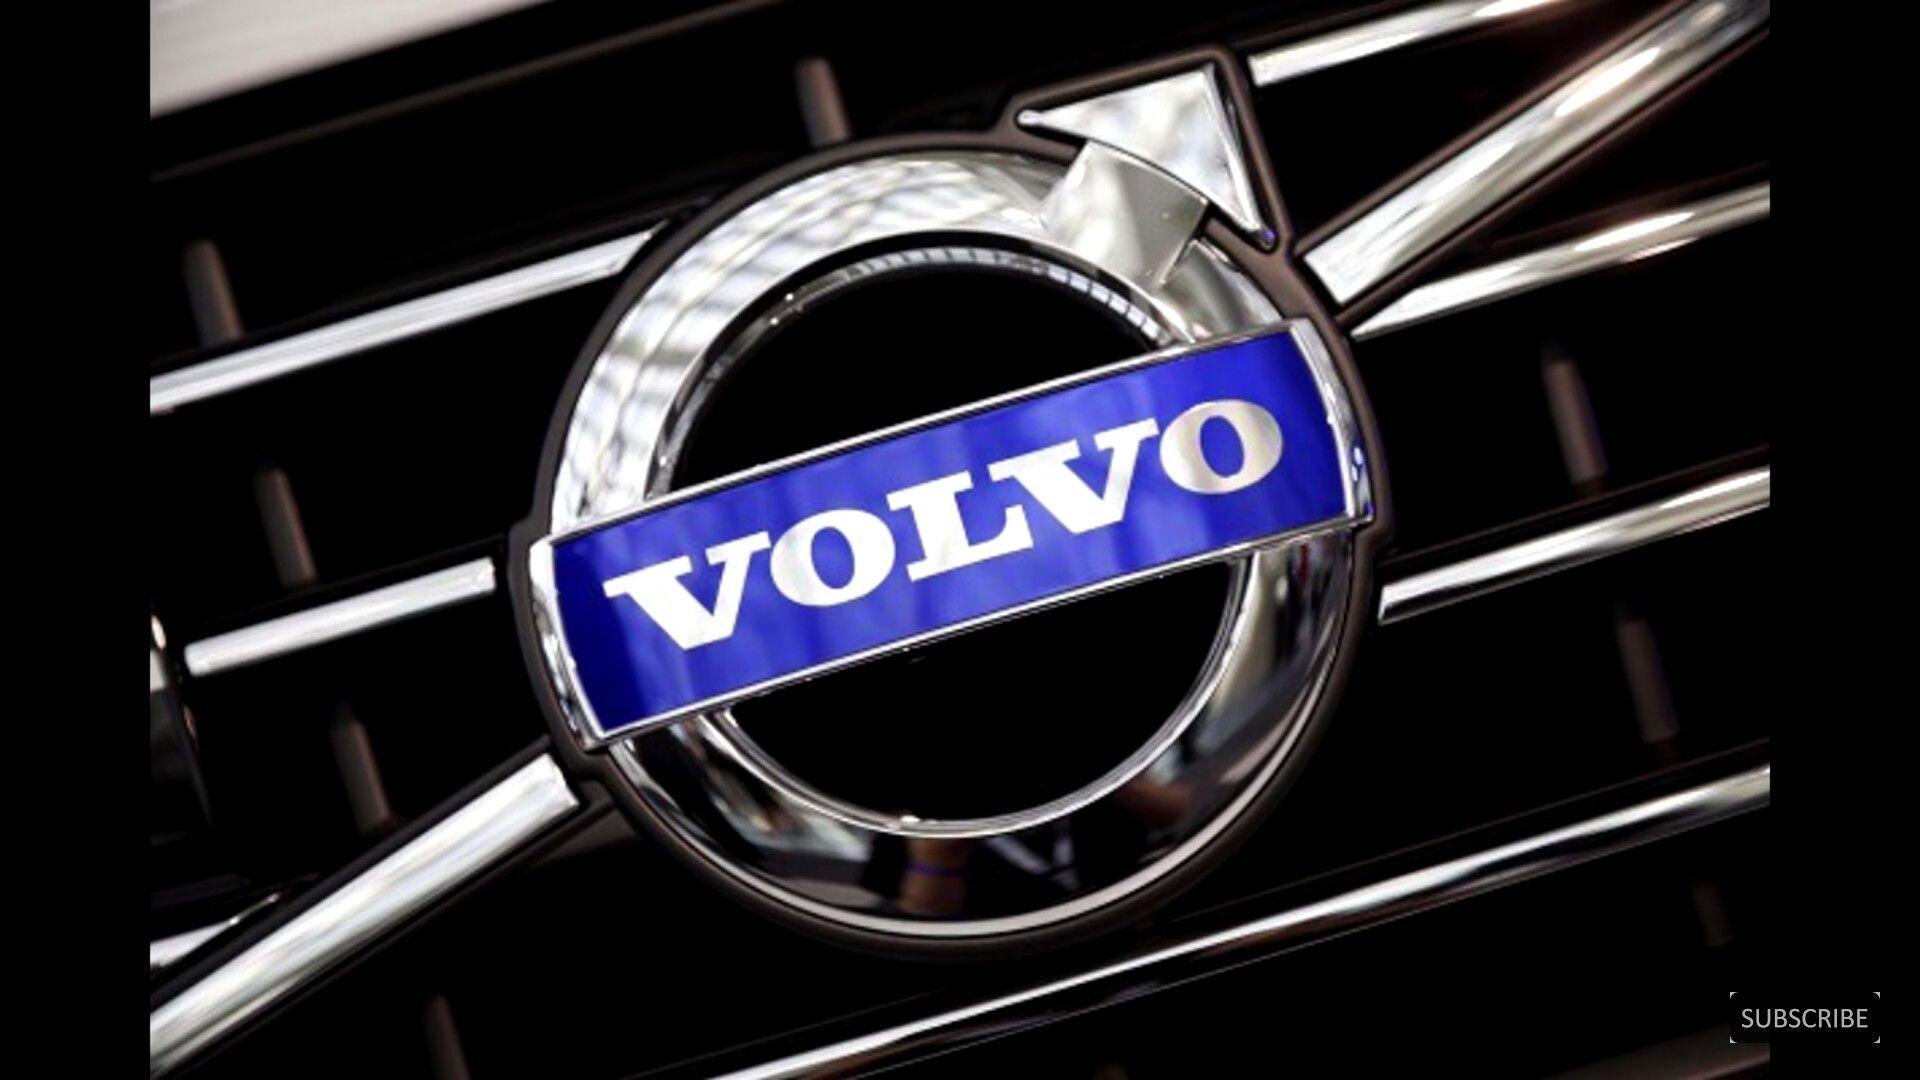 Circle Yes No Arrow In My Volvo Logo Past Memory Mandela New Perdana Tri Kpk